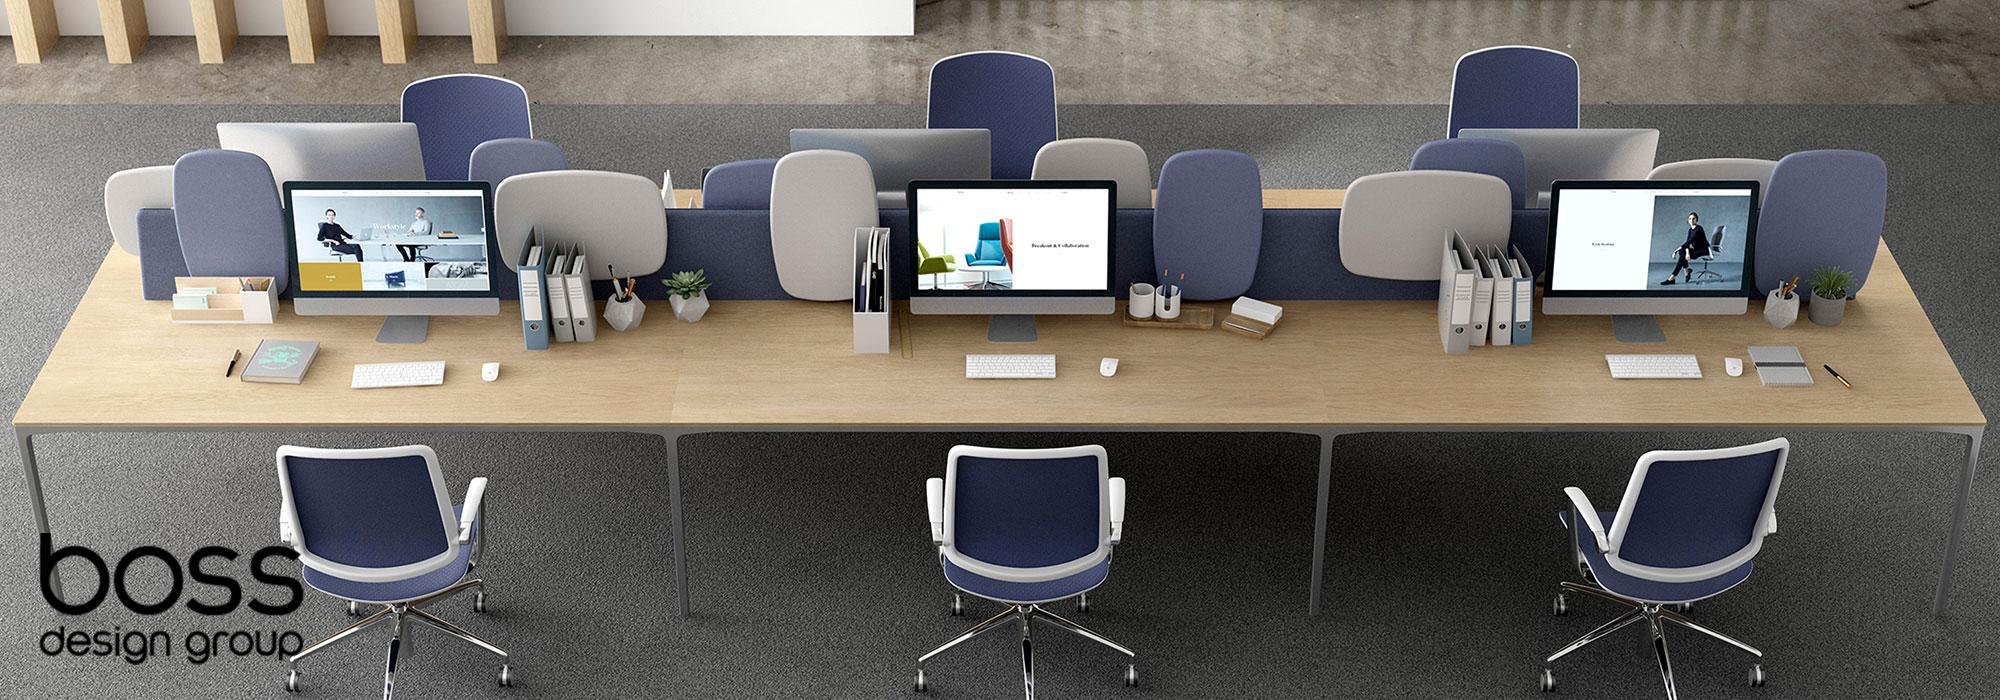 Boss Design Atom Desking & Trinetic Task Chairs